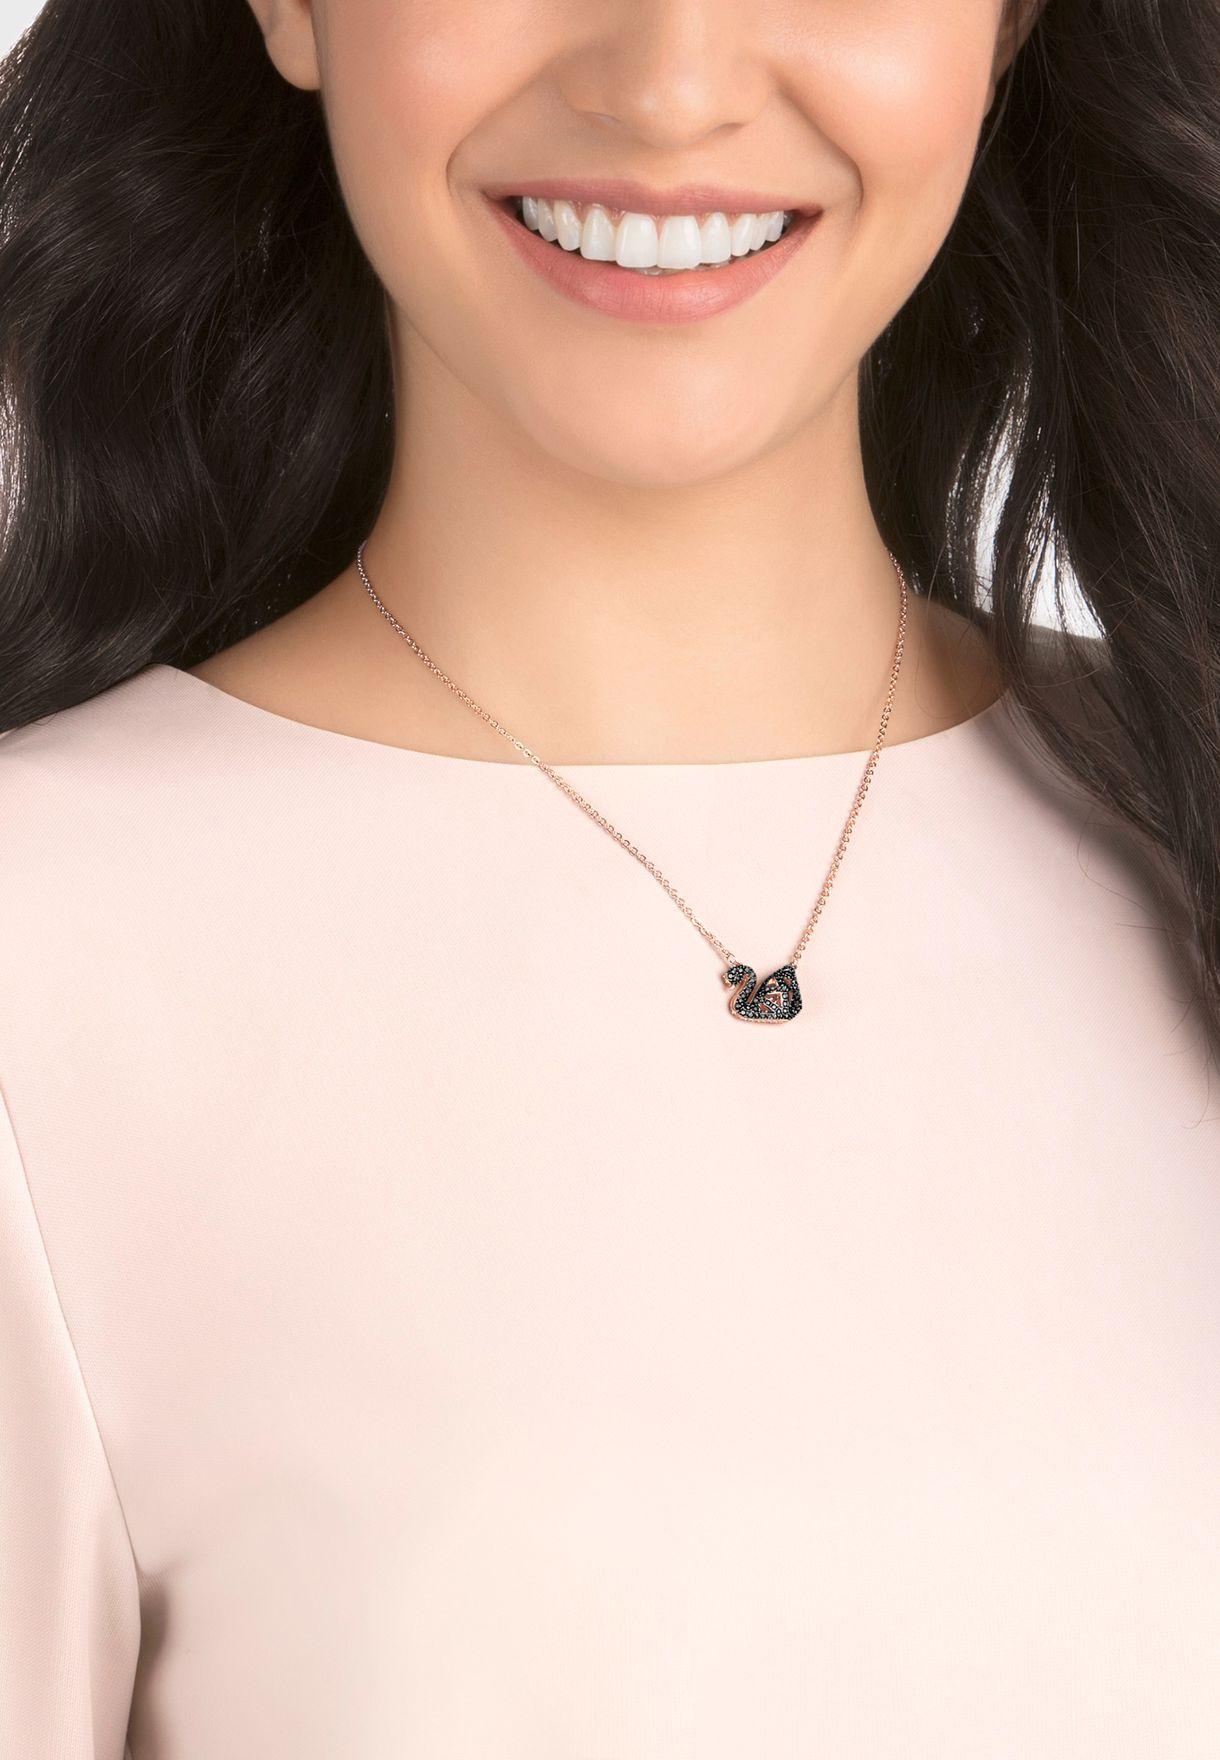 Facet Swan Necklace